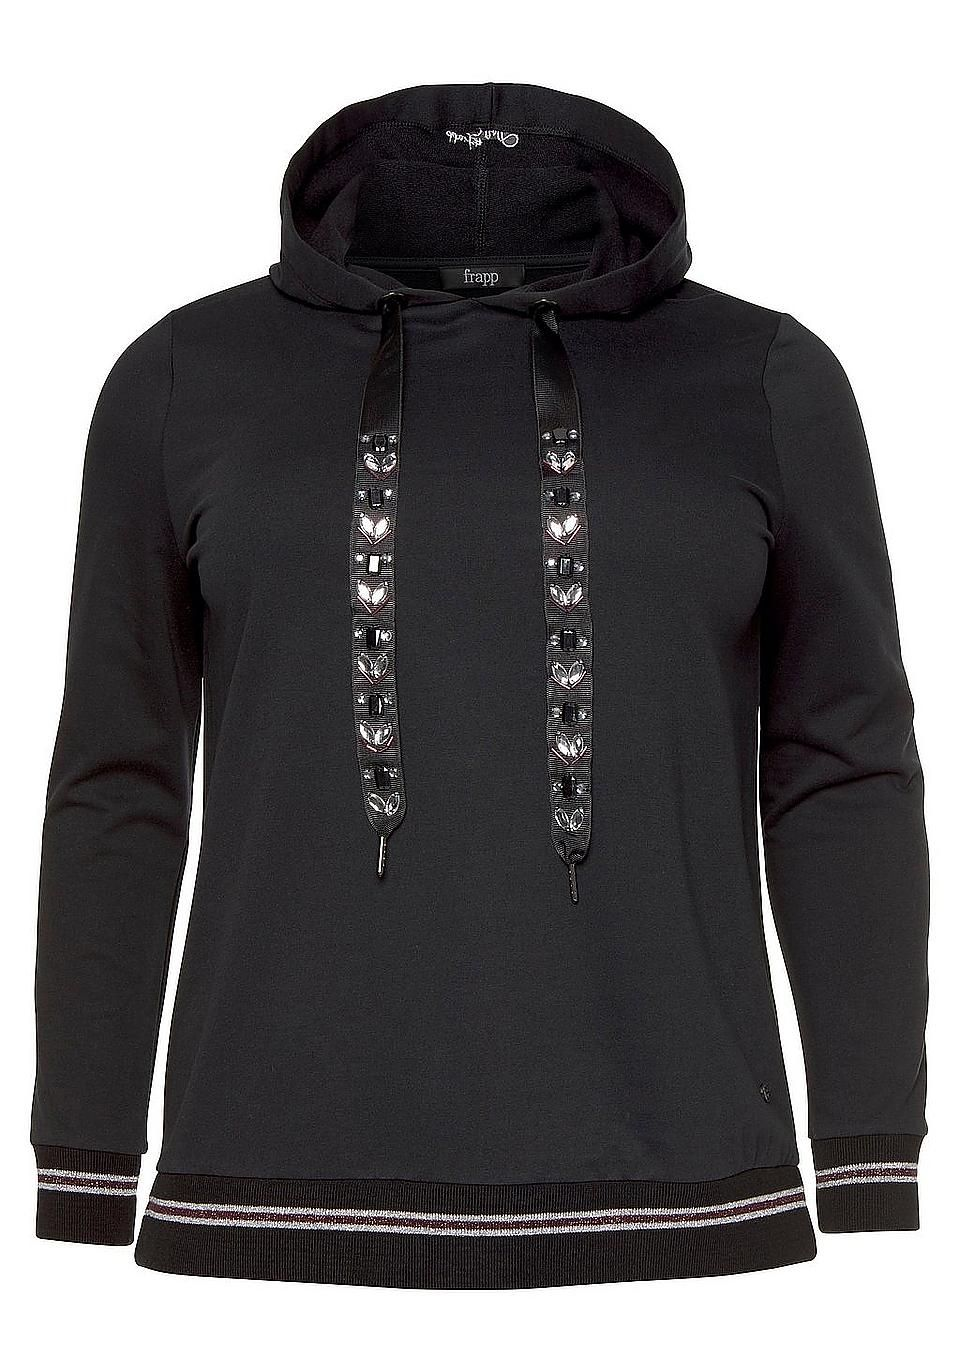 FRAPP Kapuzensweatshirt im BAUR Onlineshop   Curvy ♥   BAUR